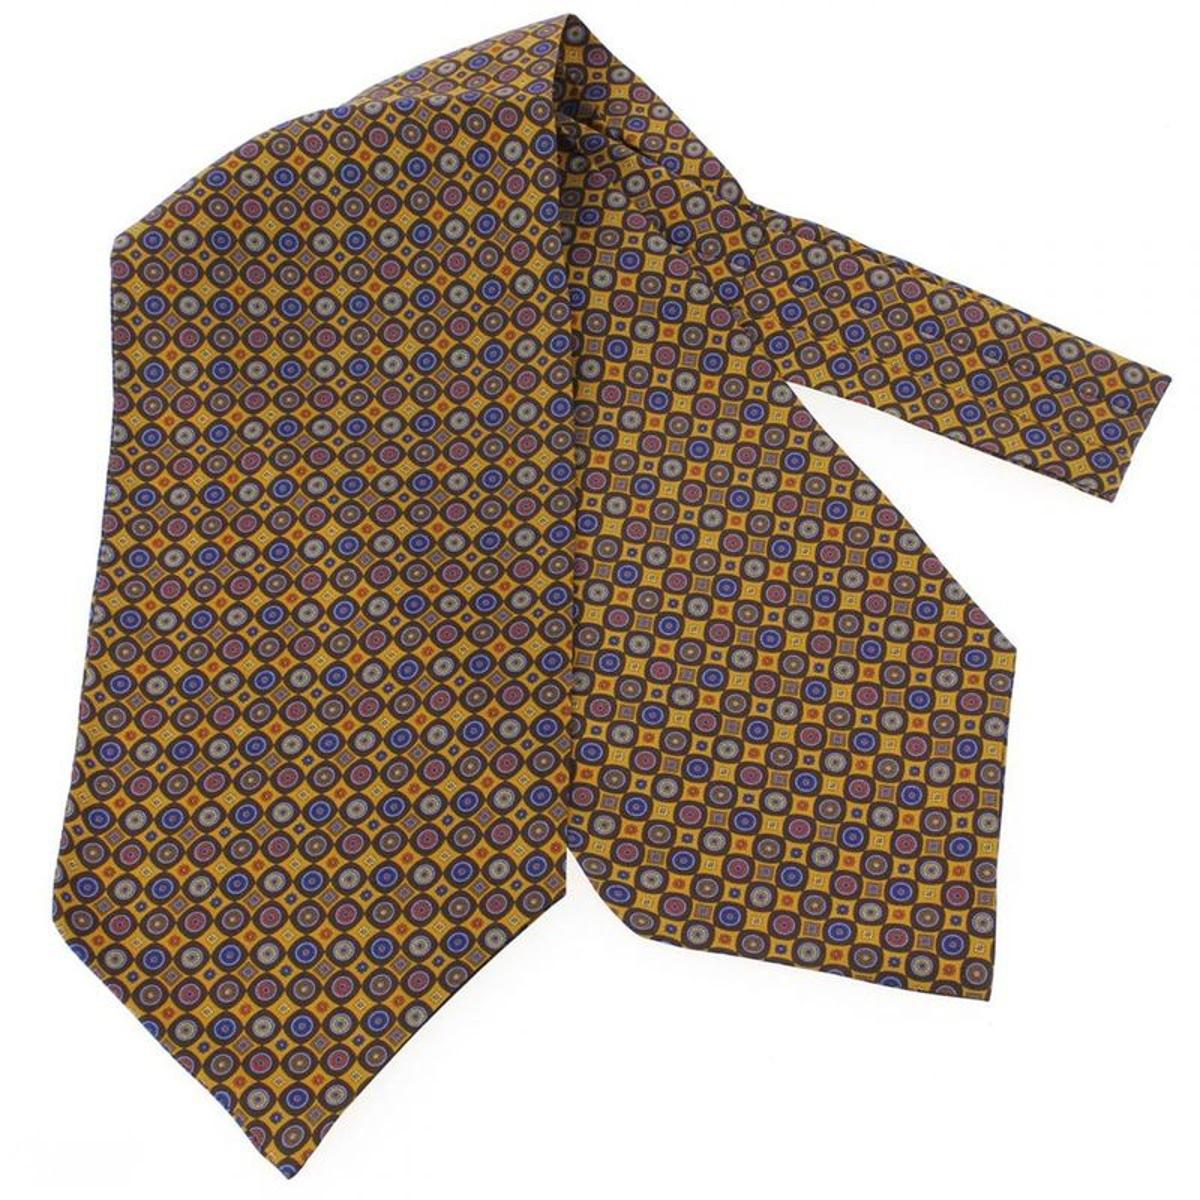 Charles Robert, Foulard Ascot soie, Victoria, cercles jaune